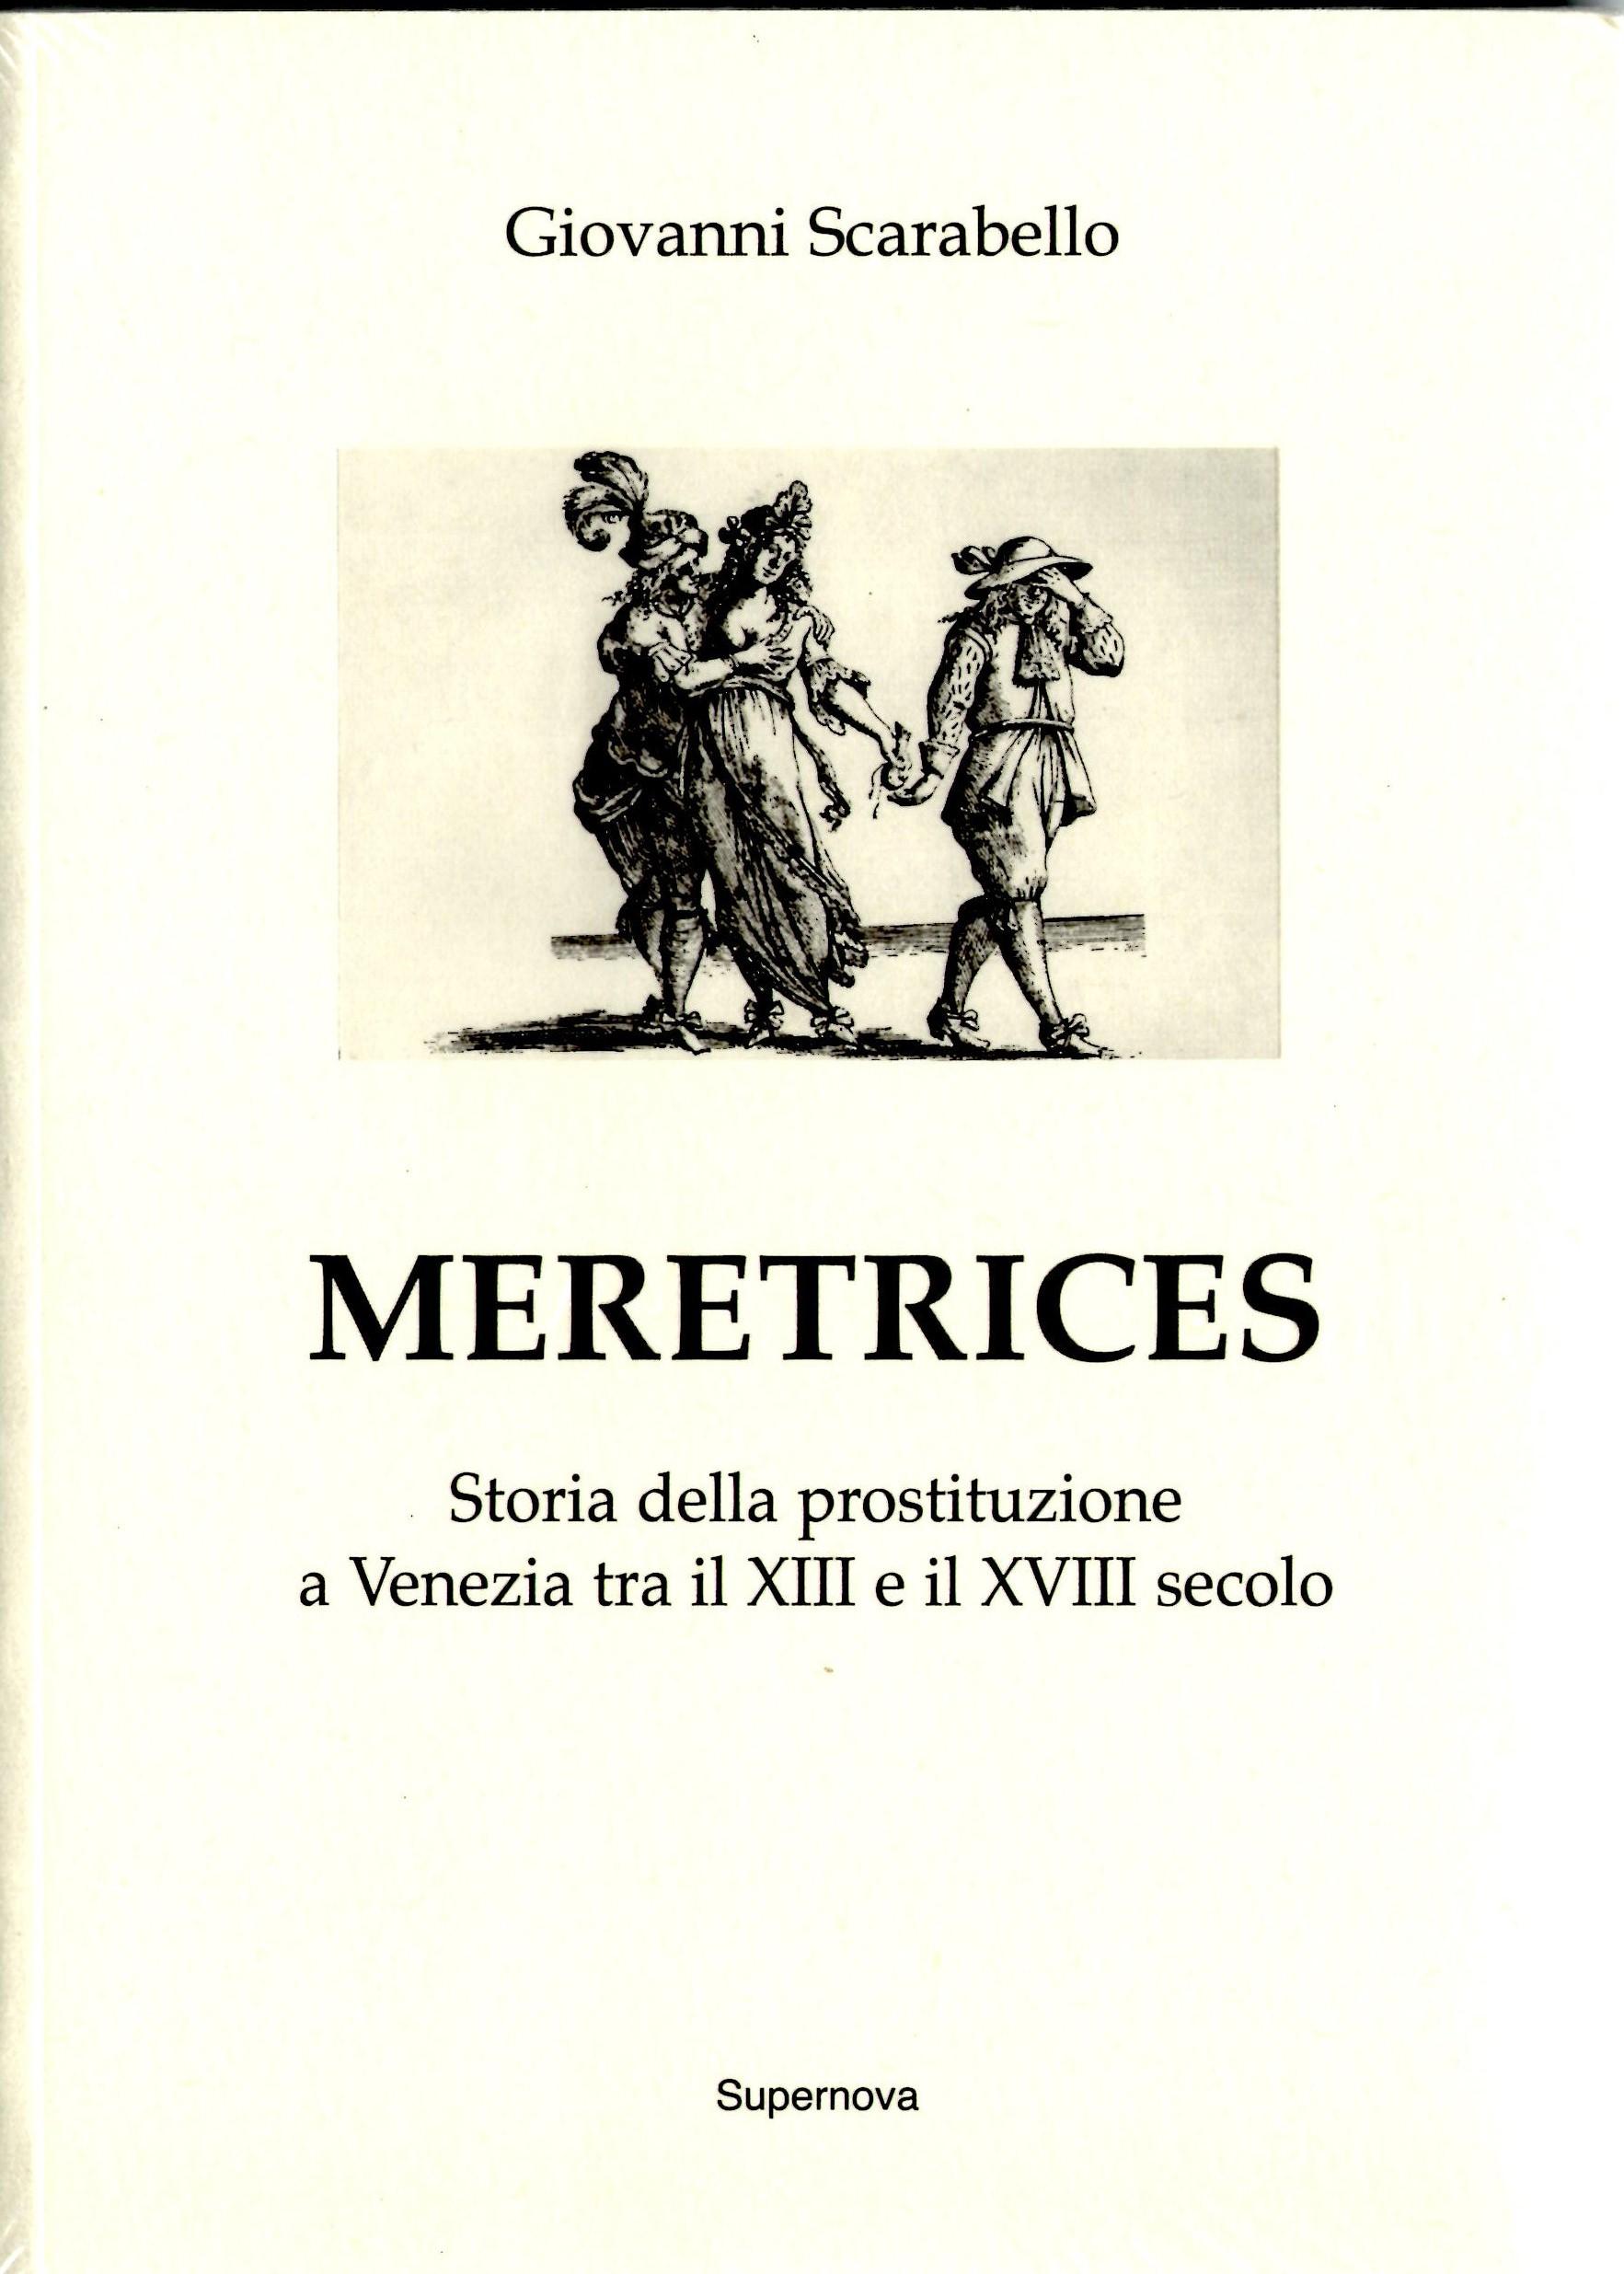 Meretrices